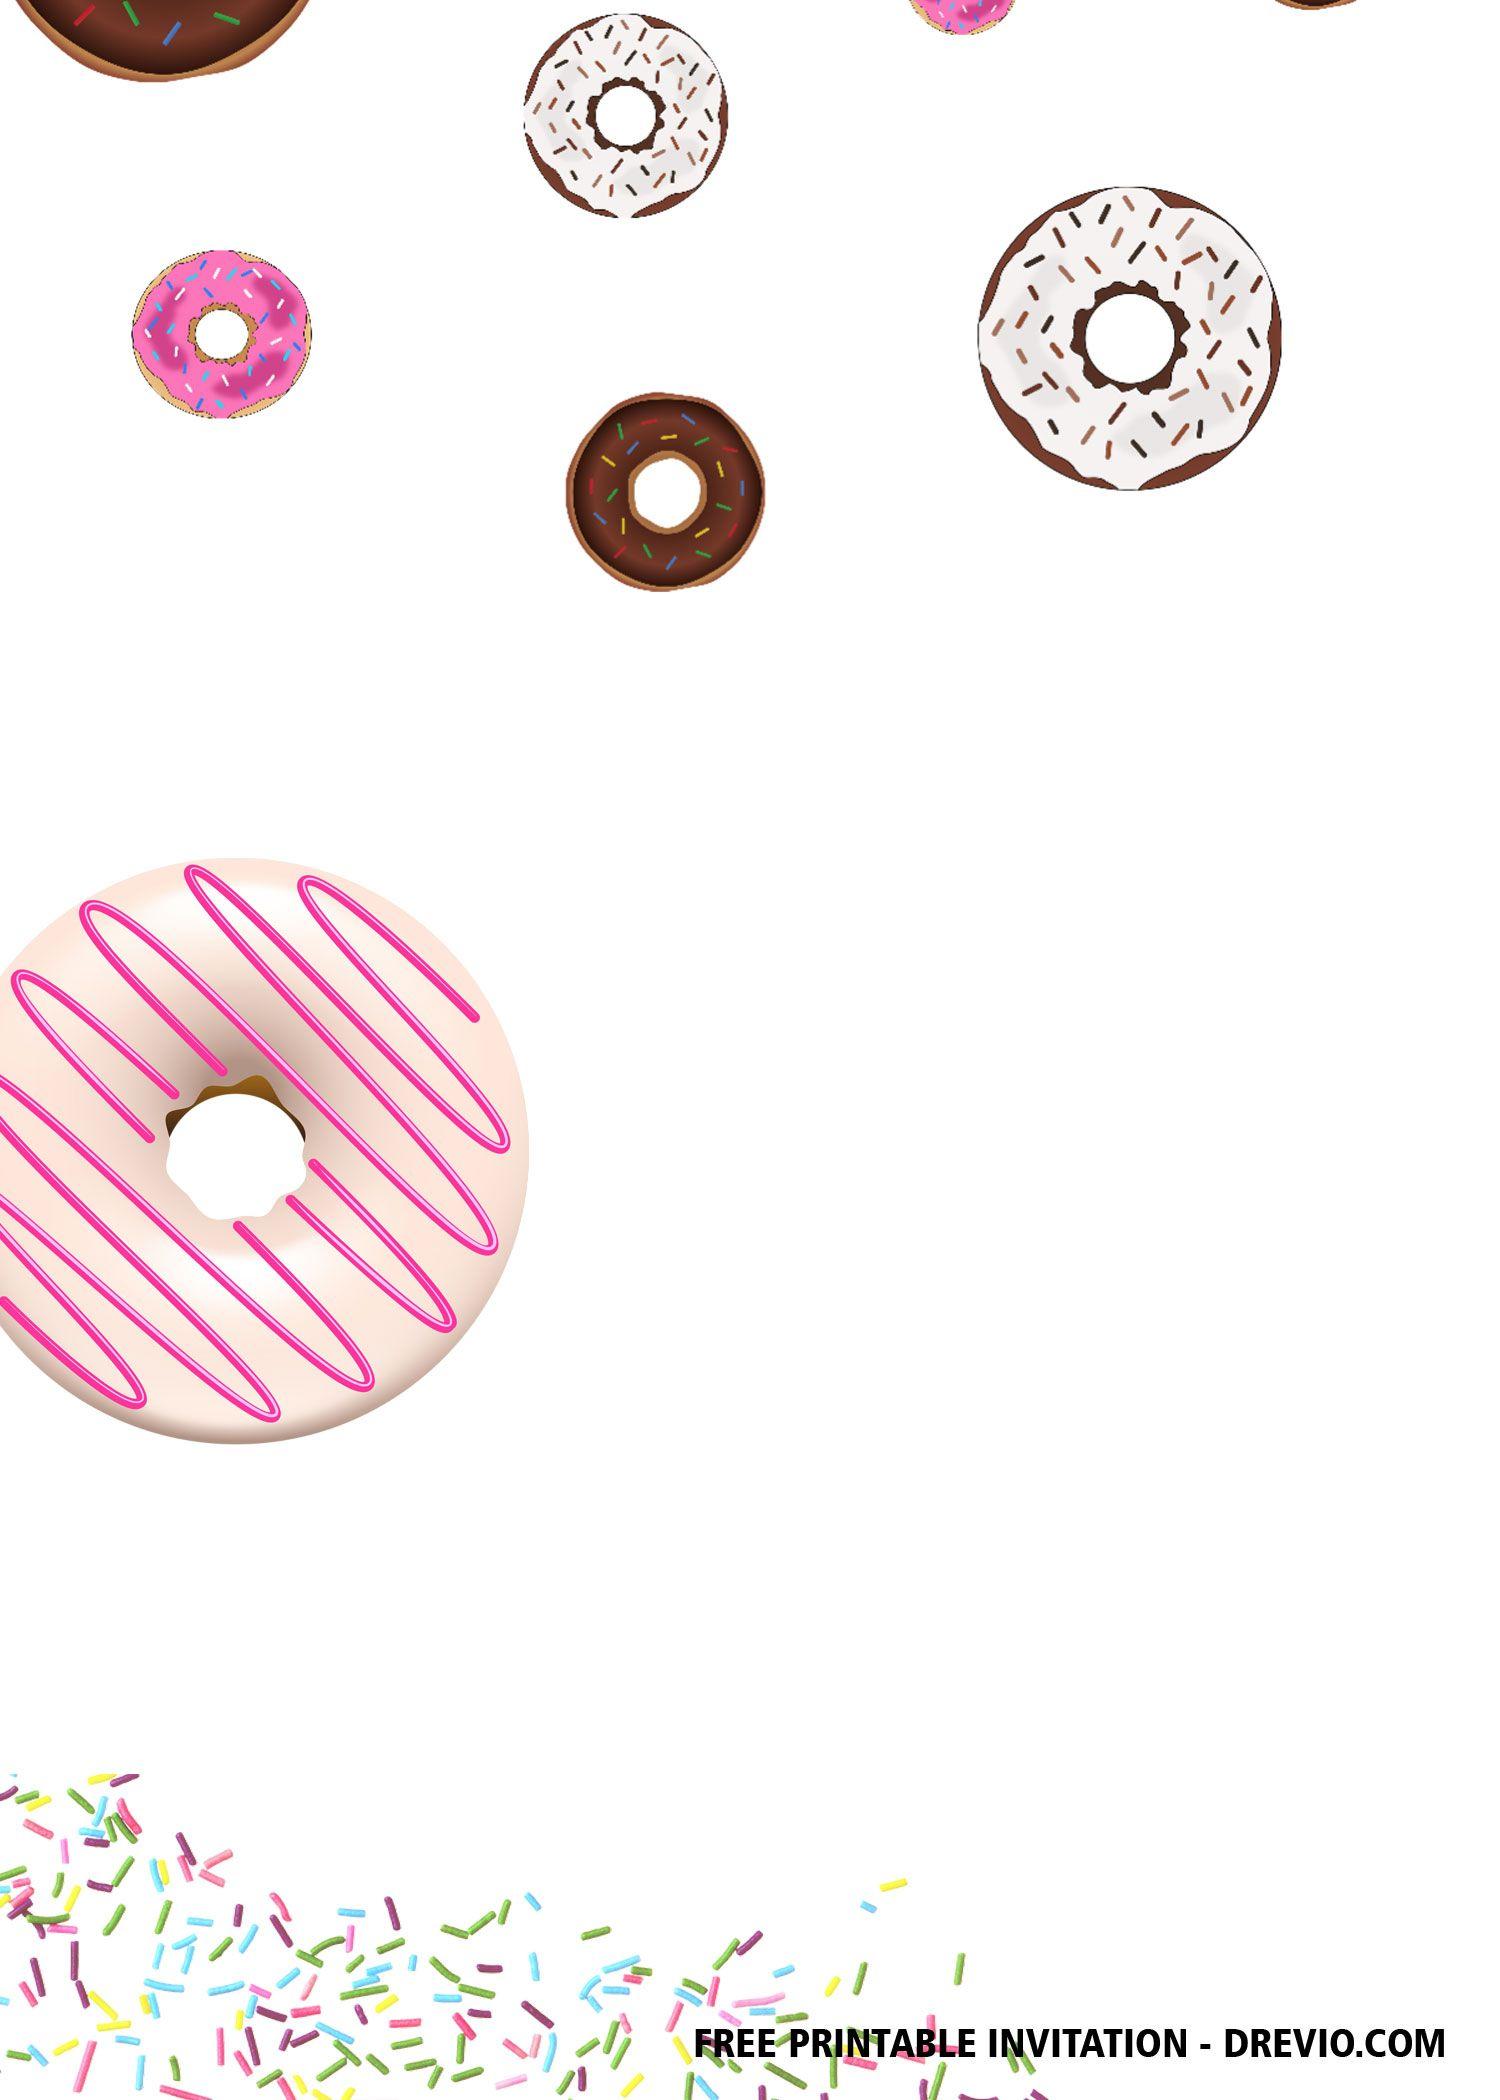 Free Printable Colorful Donuts Invitation Templates Donut Invitation Printable Birthday Invitations Free Printable Birthday Invitations